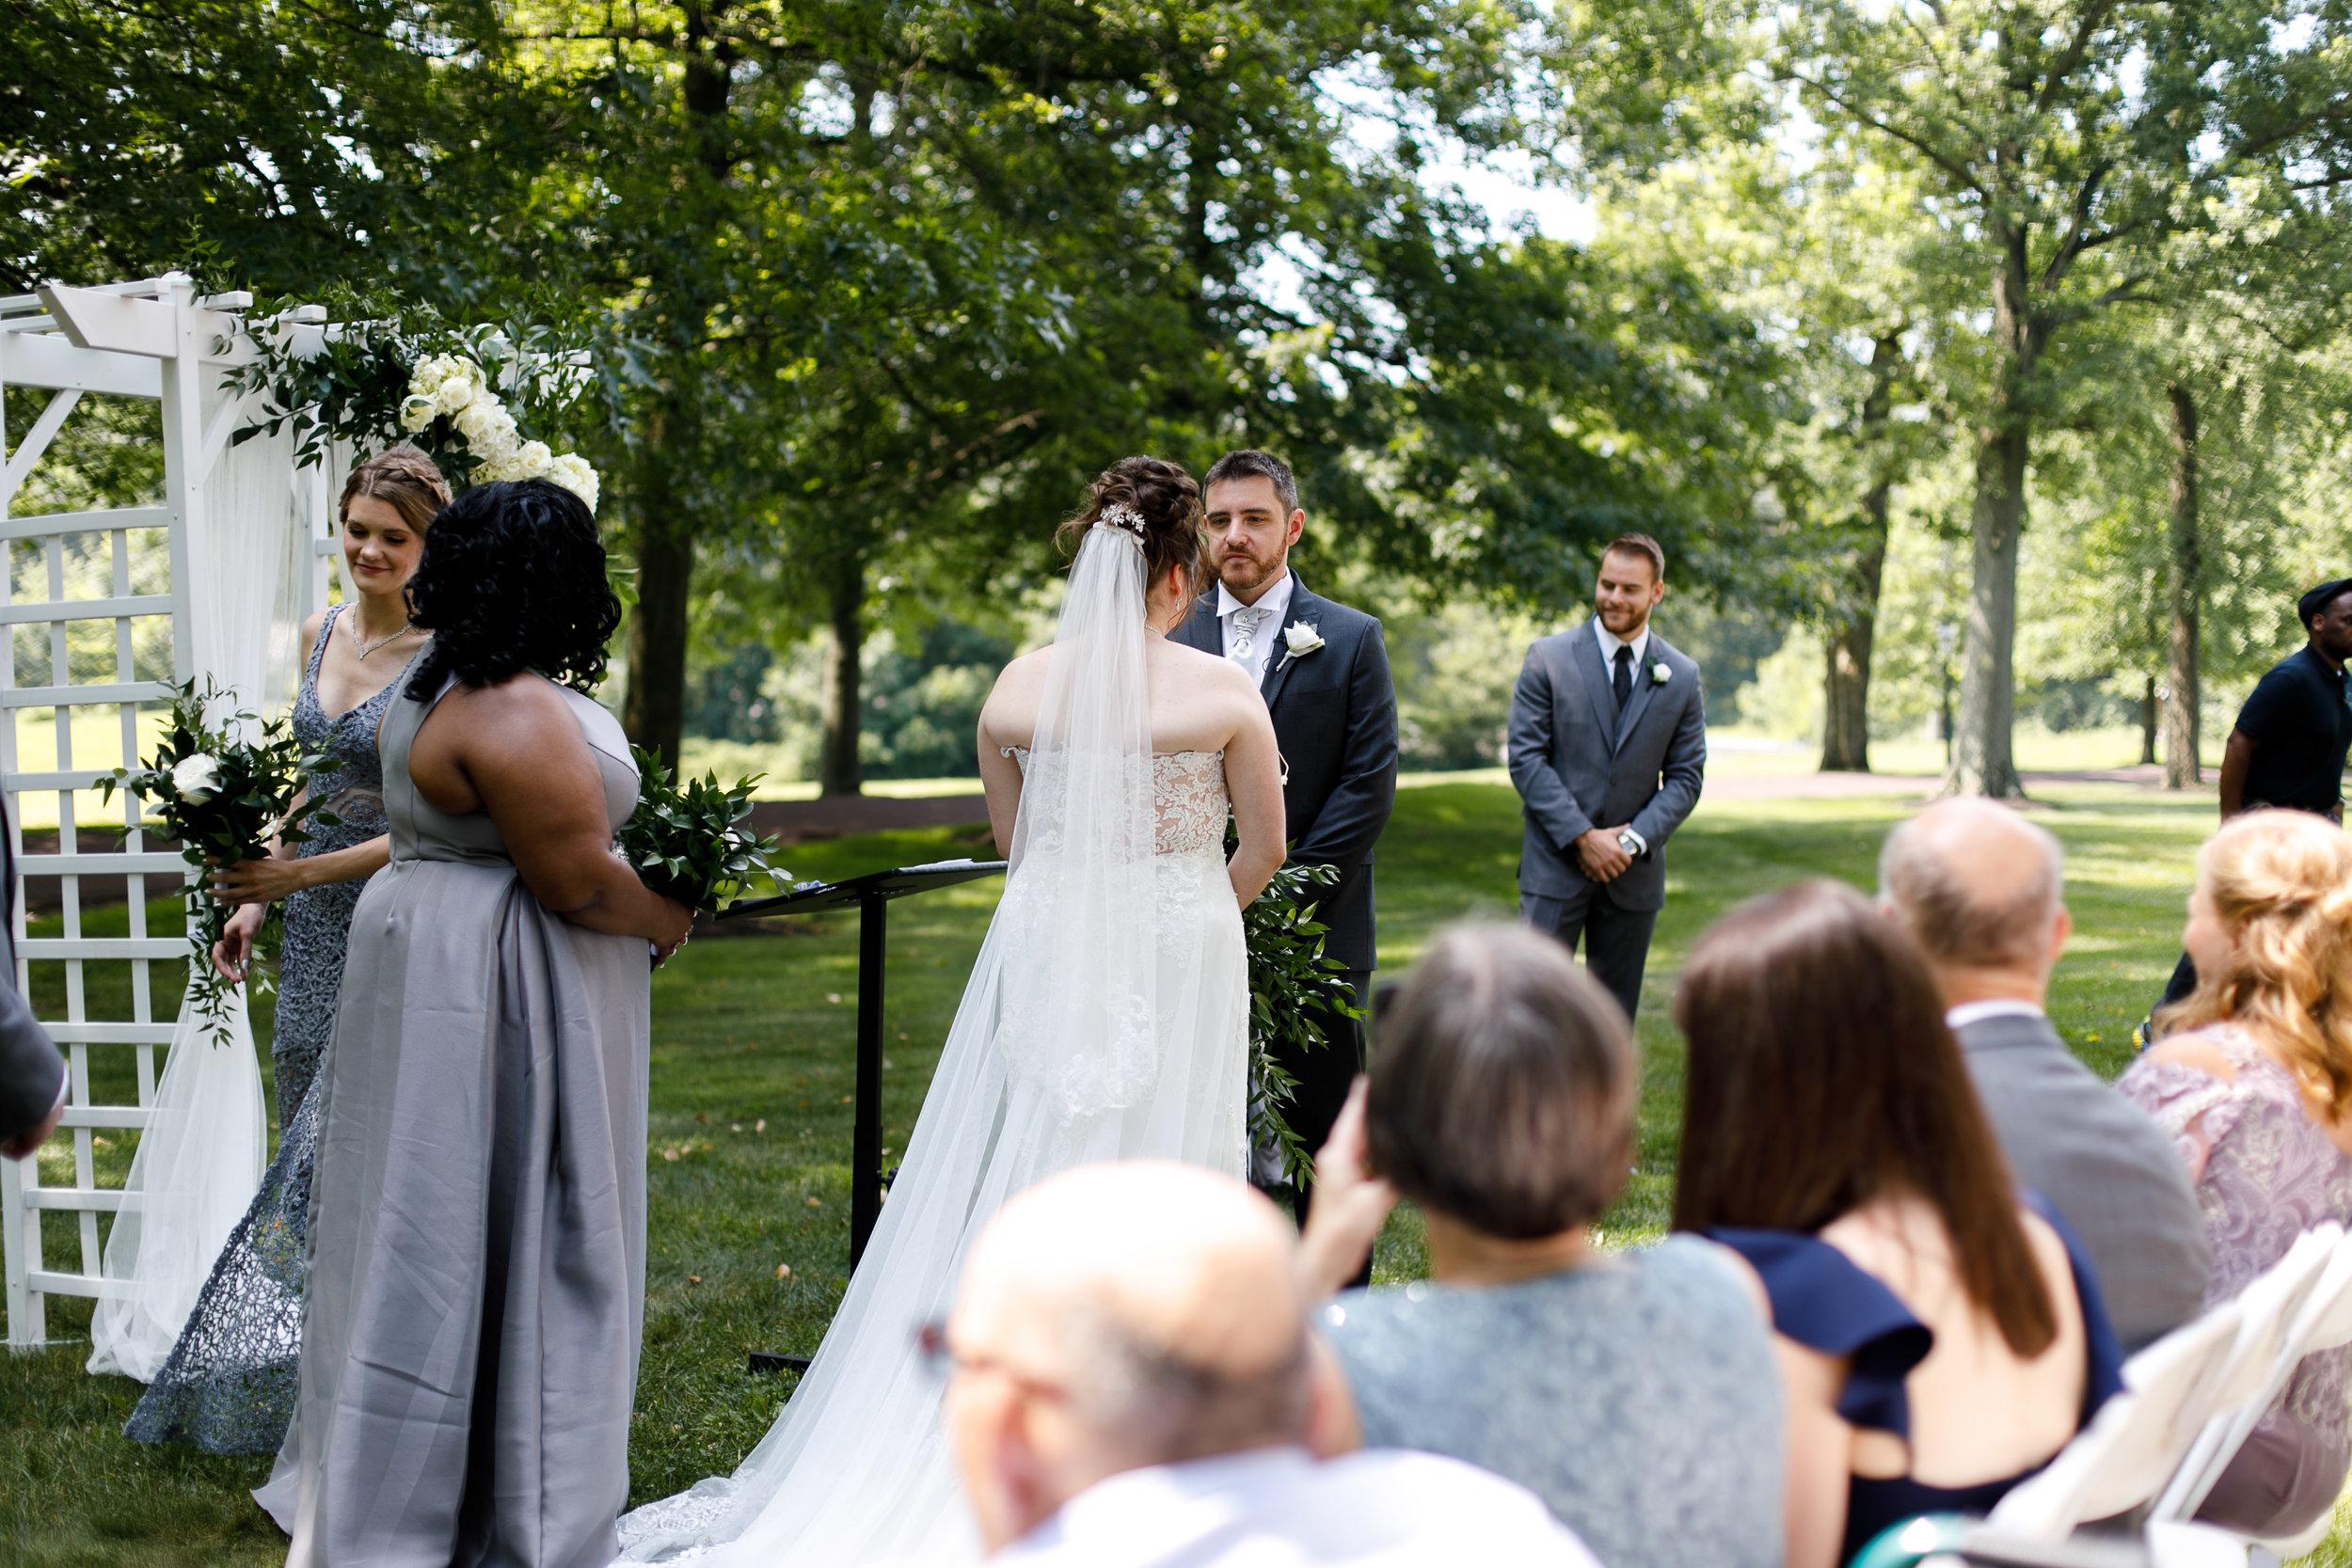 Wedding at Joseph Ambler In Bucks County PA31.jpg